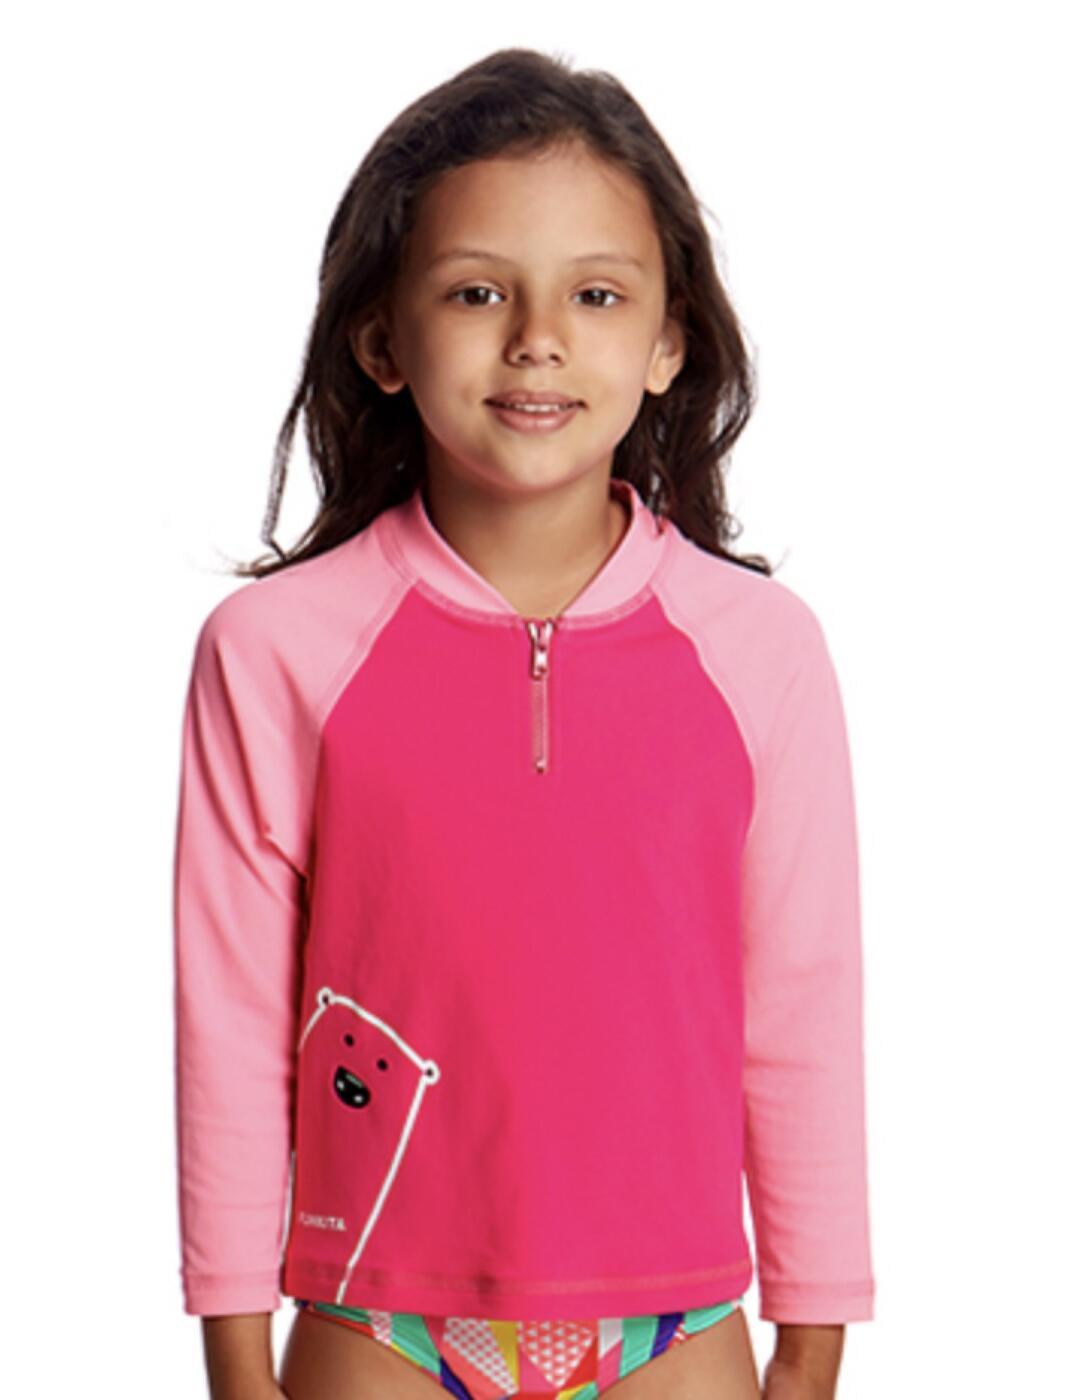 FKS004T01244 Funkita Toddler Girls Zippy Rash Swim Vest Top - FKS004T01244 Stare Bear